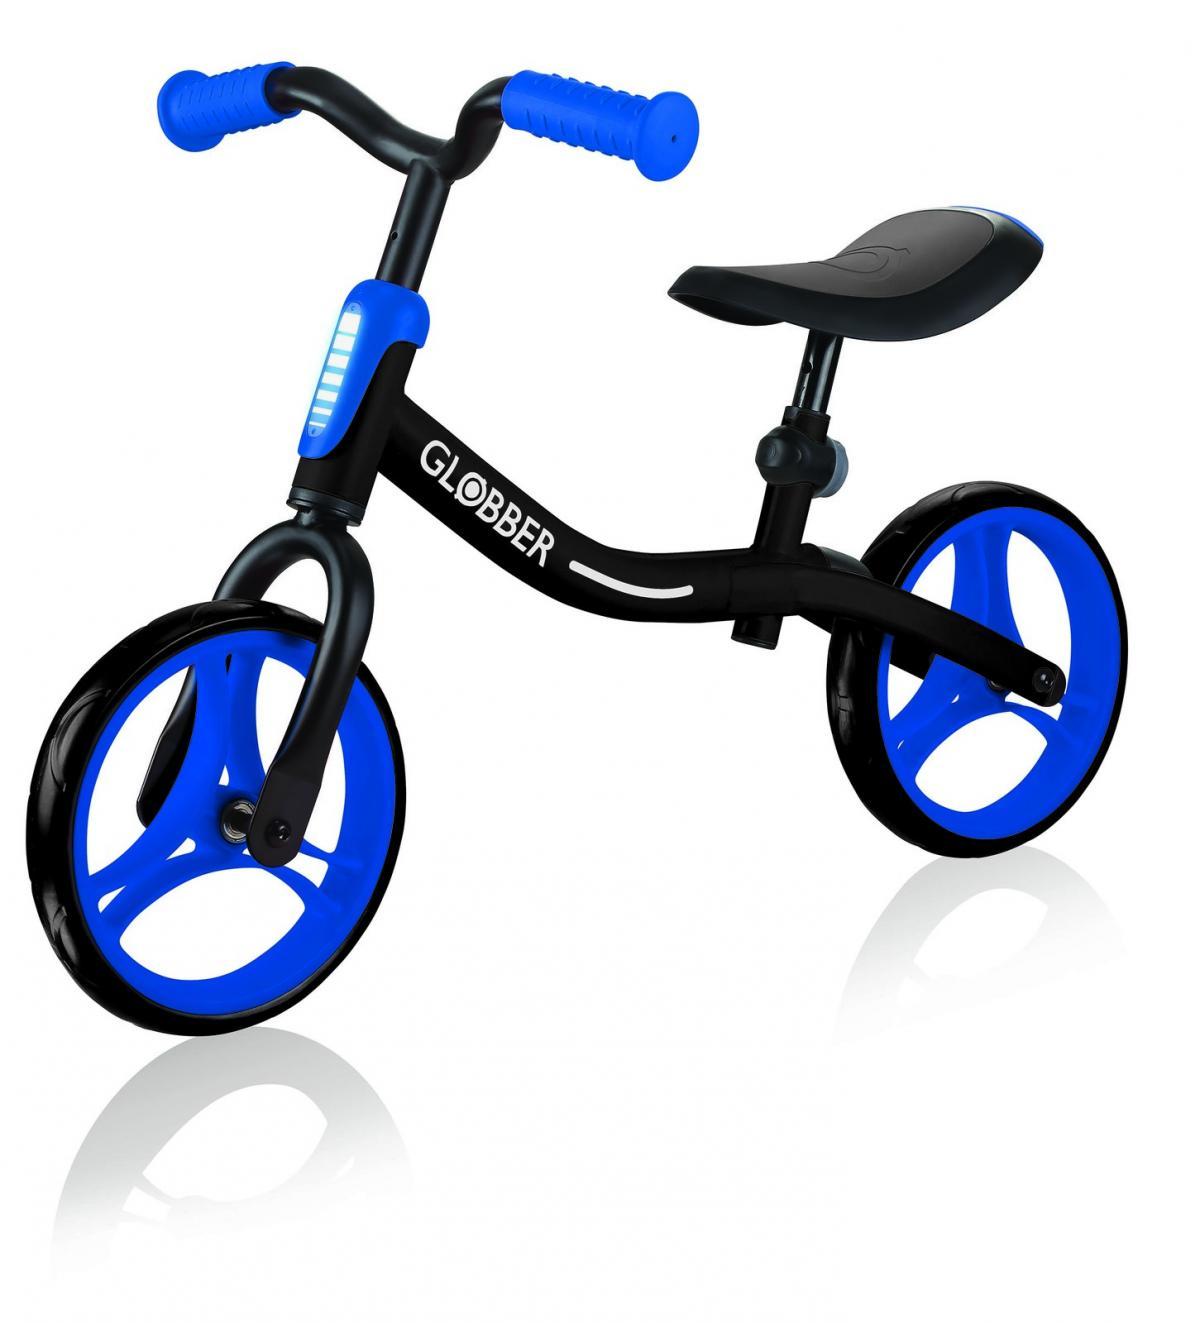 Globber Go Balance Bike Blue